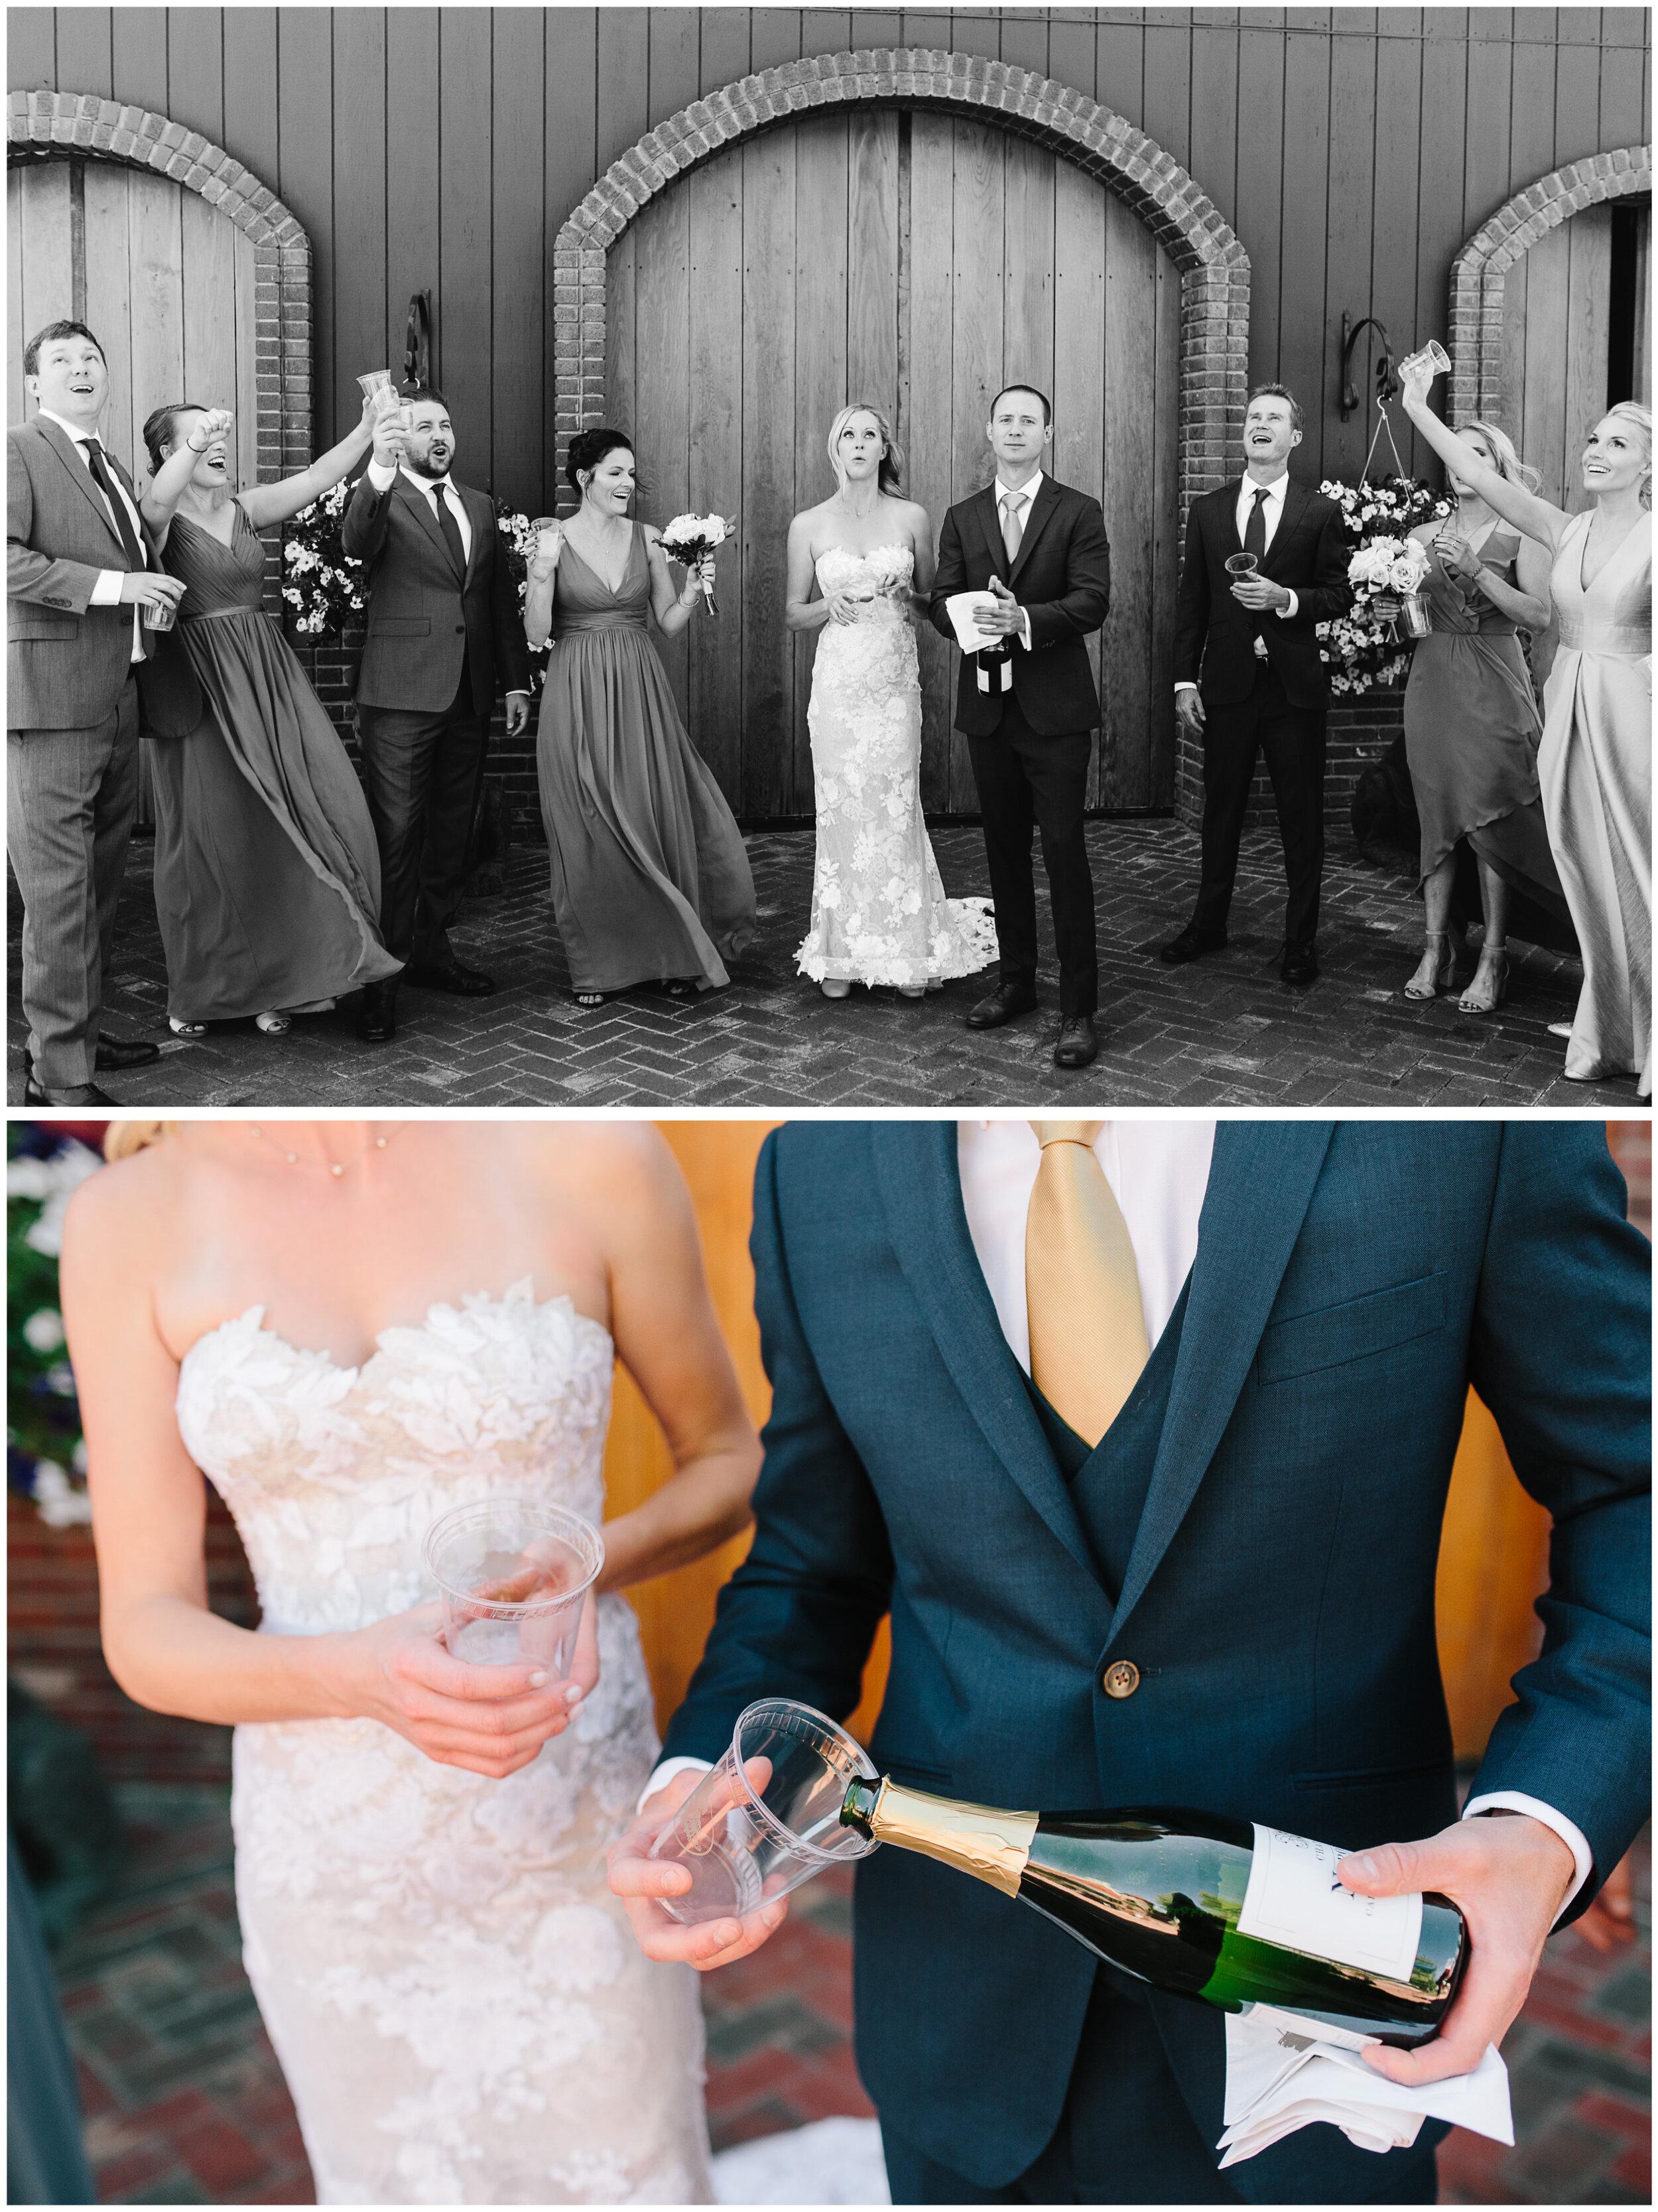 larkspur_colorado_wedding_33.jpg